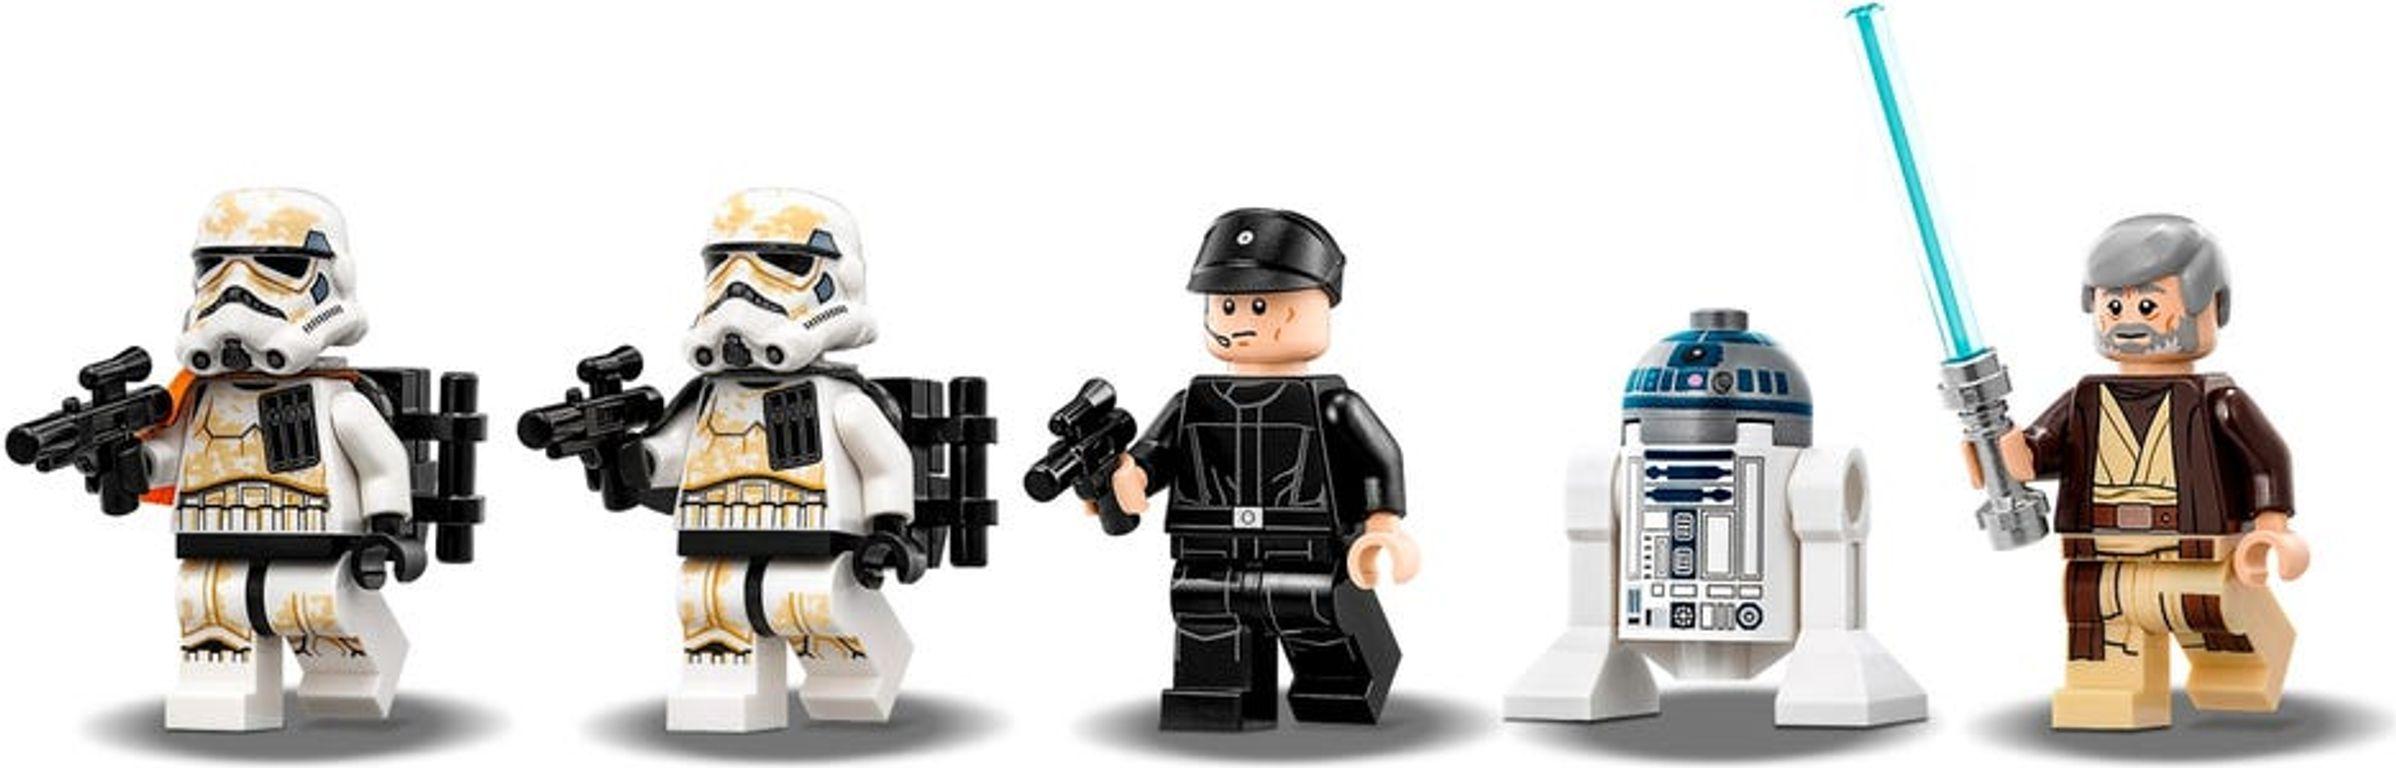 Imperial Landing Craft minifigures